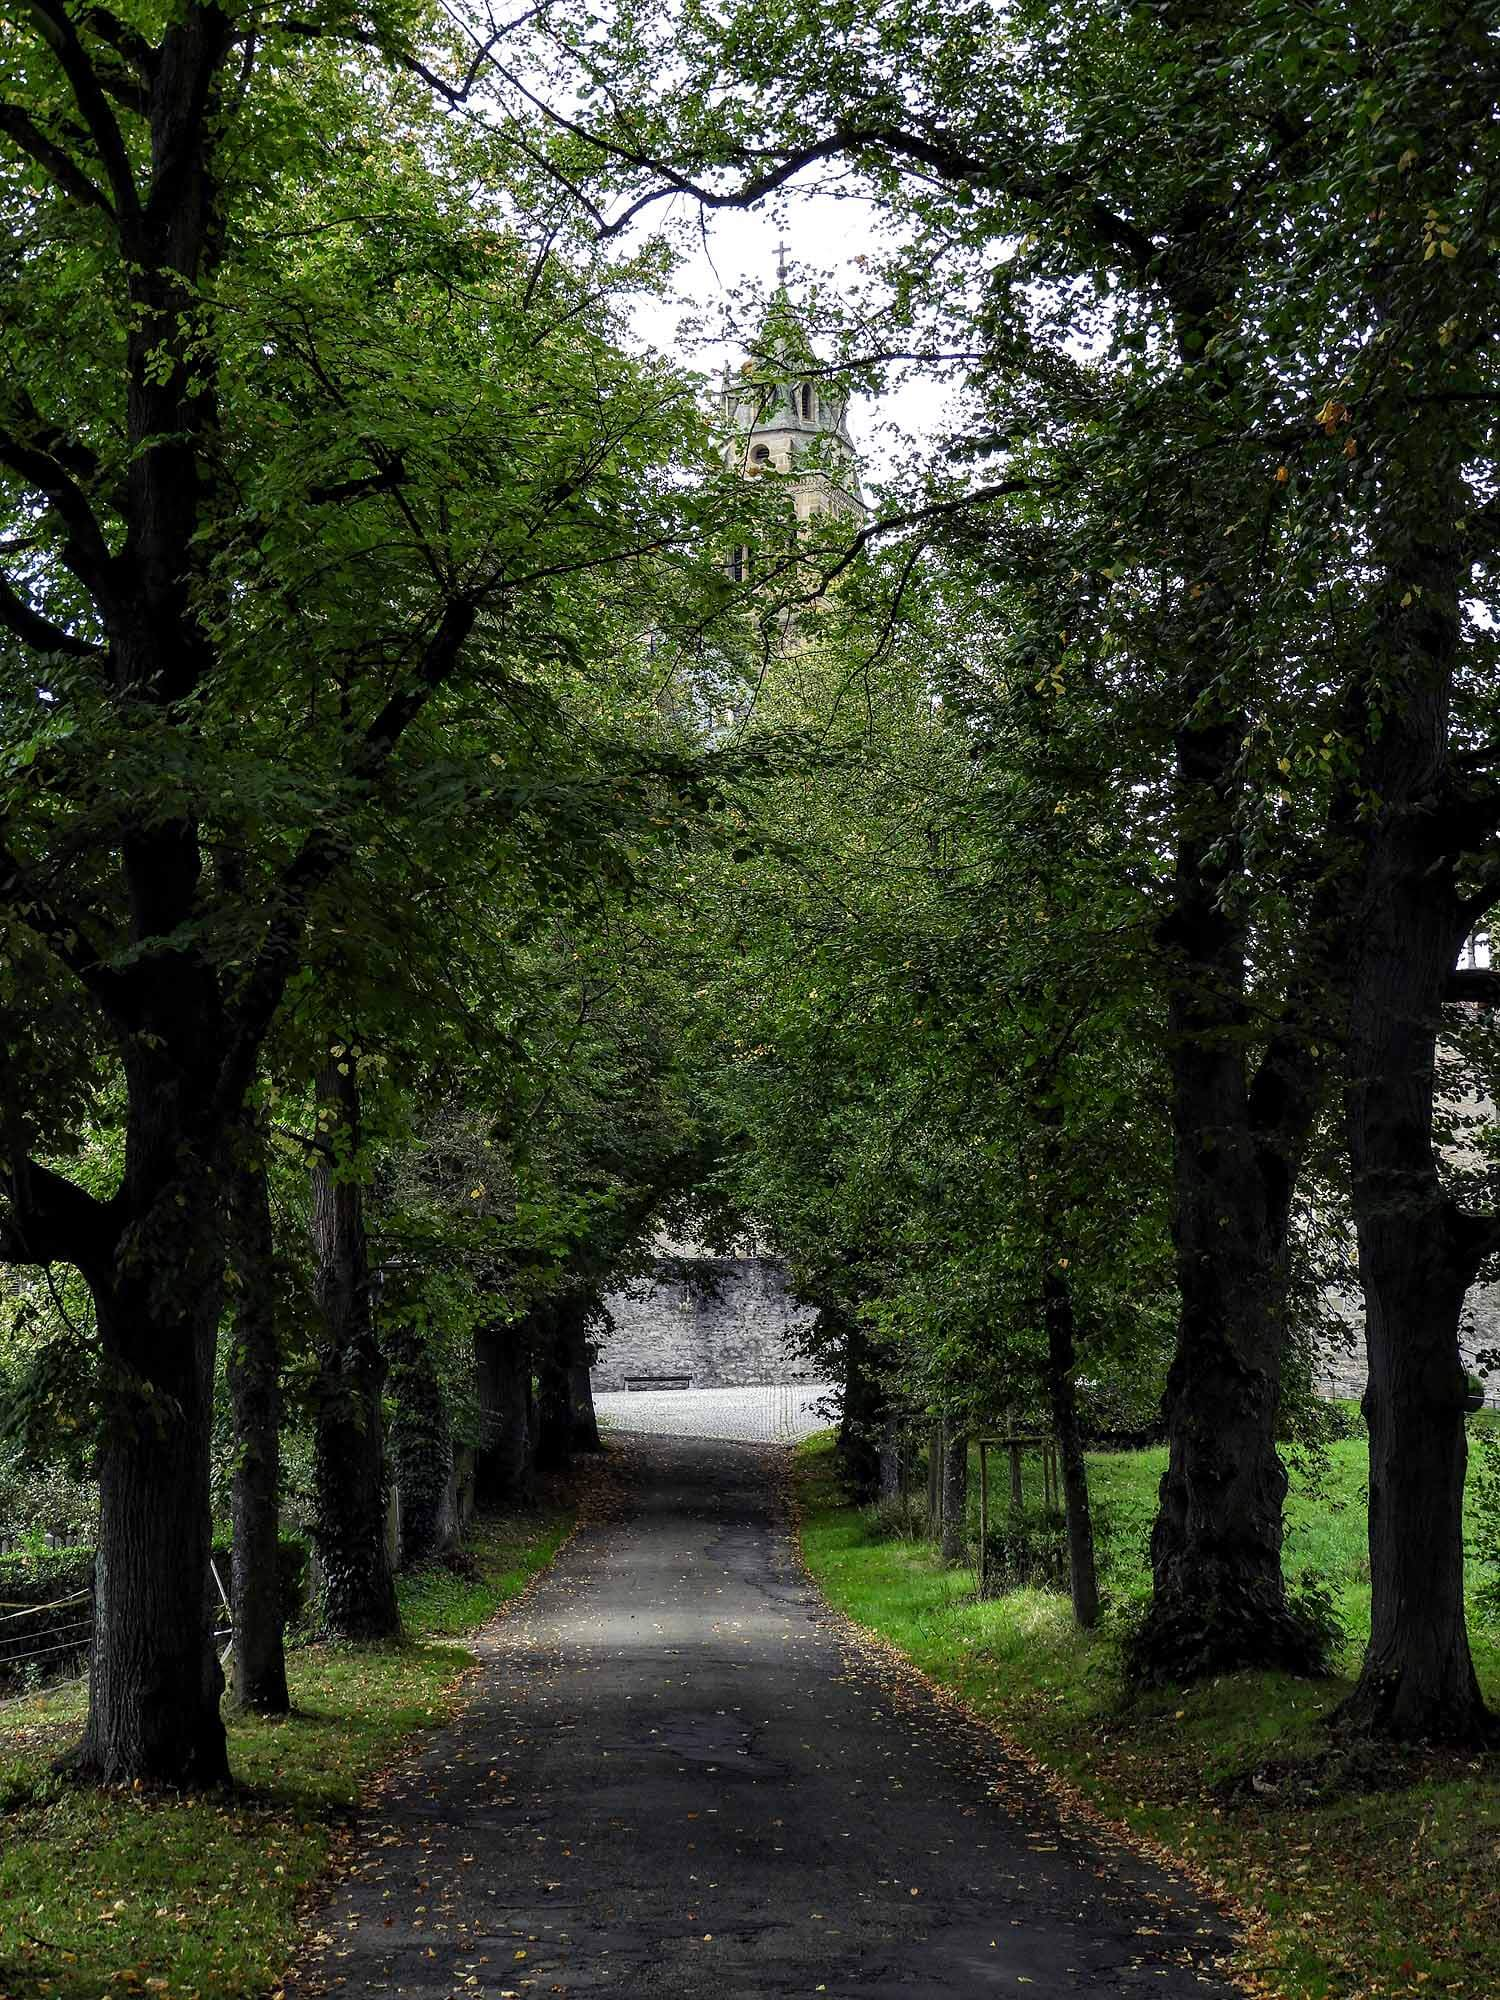 germany-kloster-grosscomburg-tree-lined-street.jpg